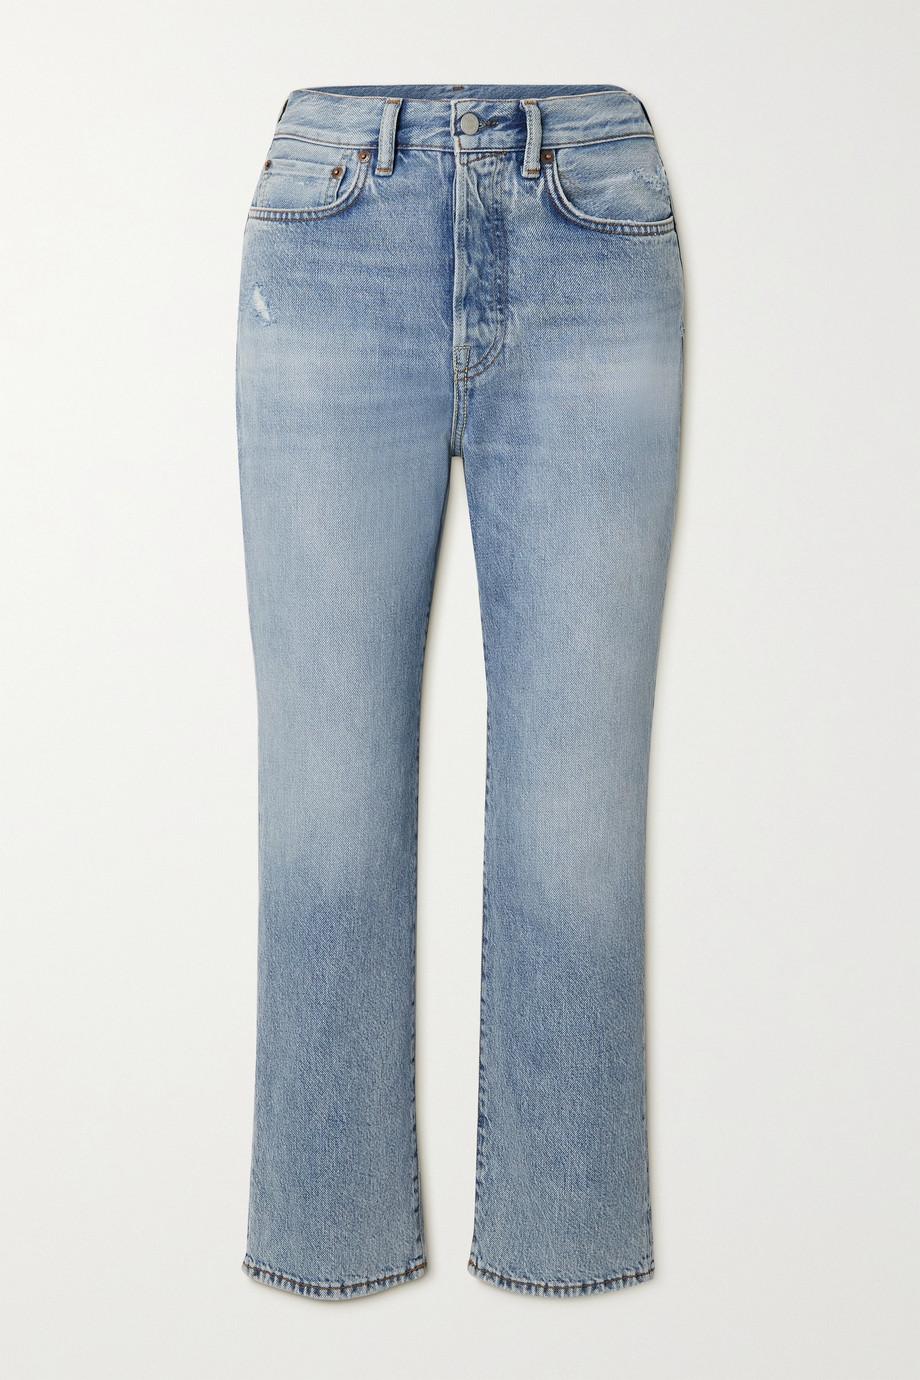 Acne Studios Distressed high-rise straight-leg jeans